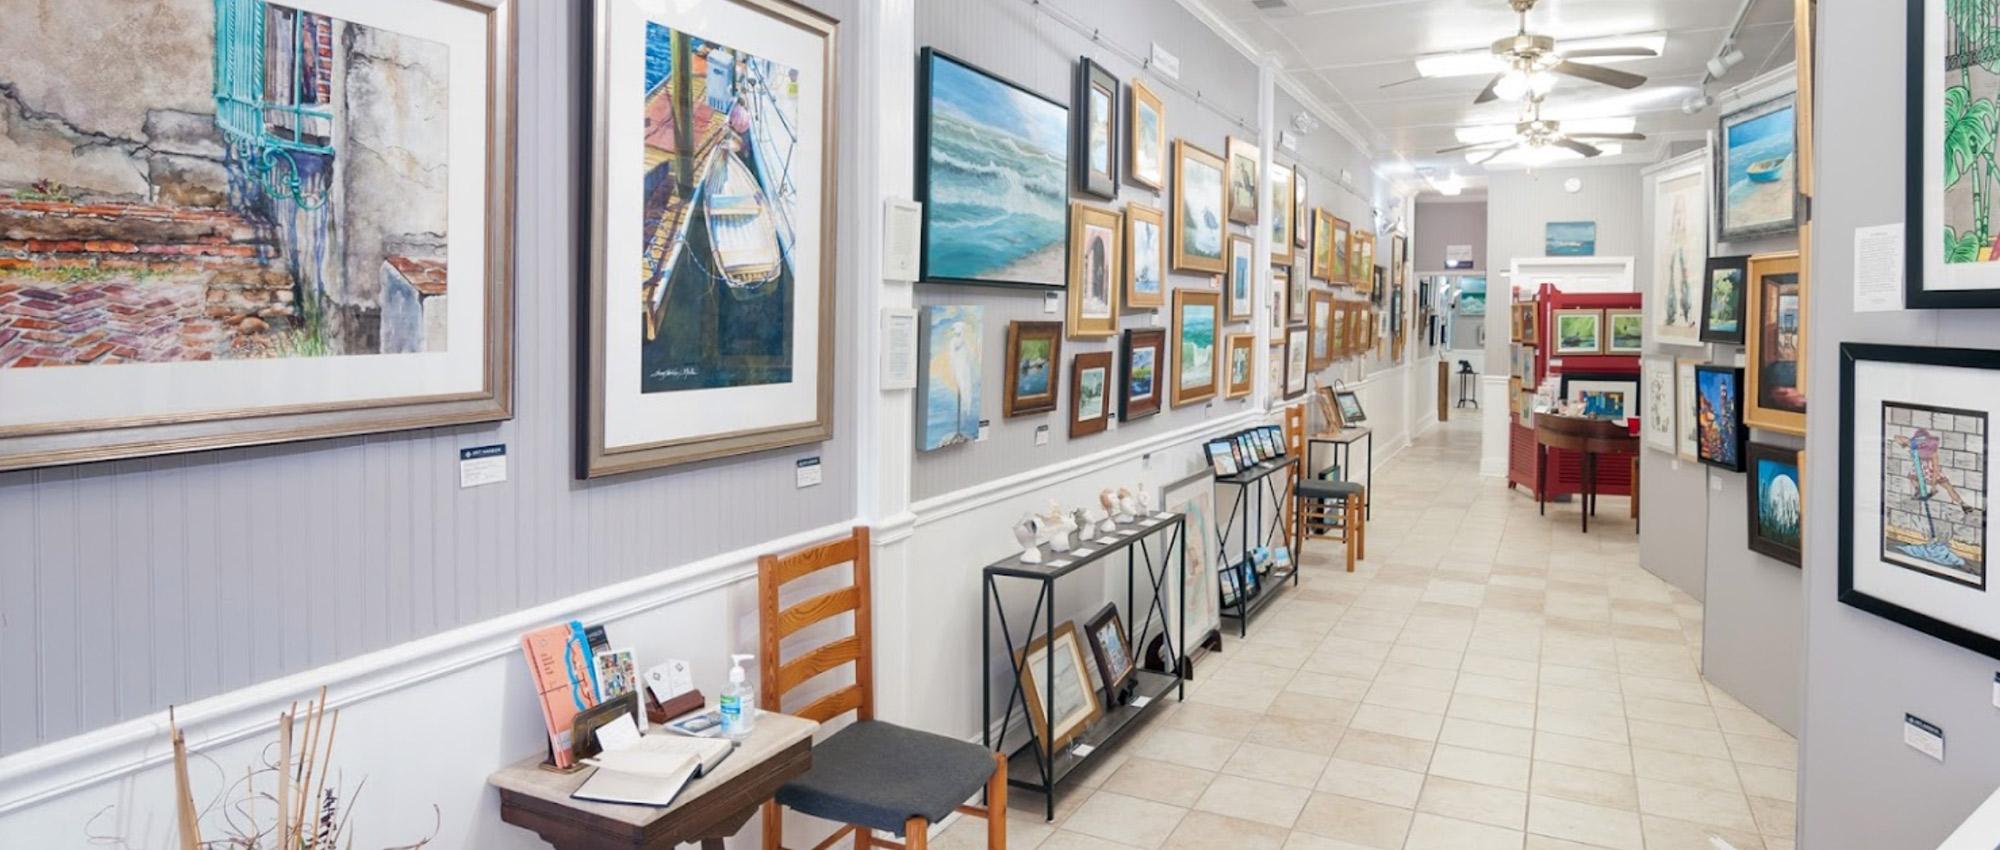 Art Harbor Gallery